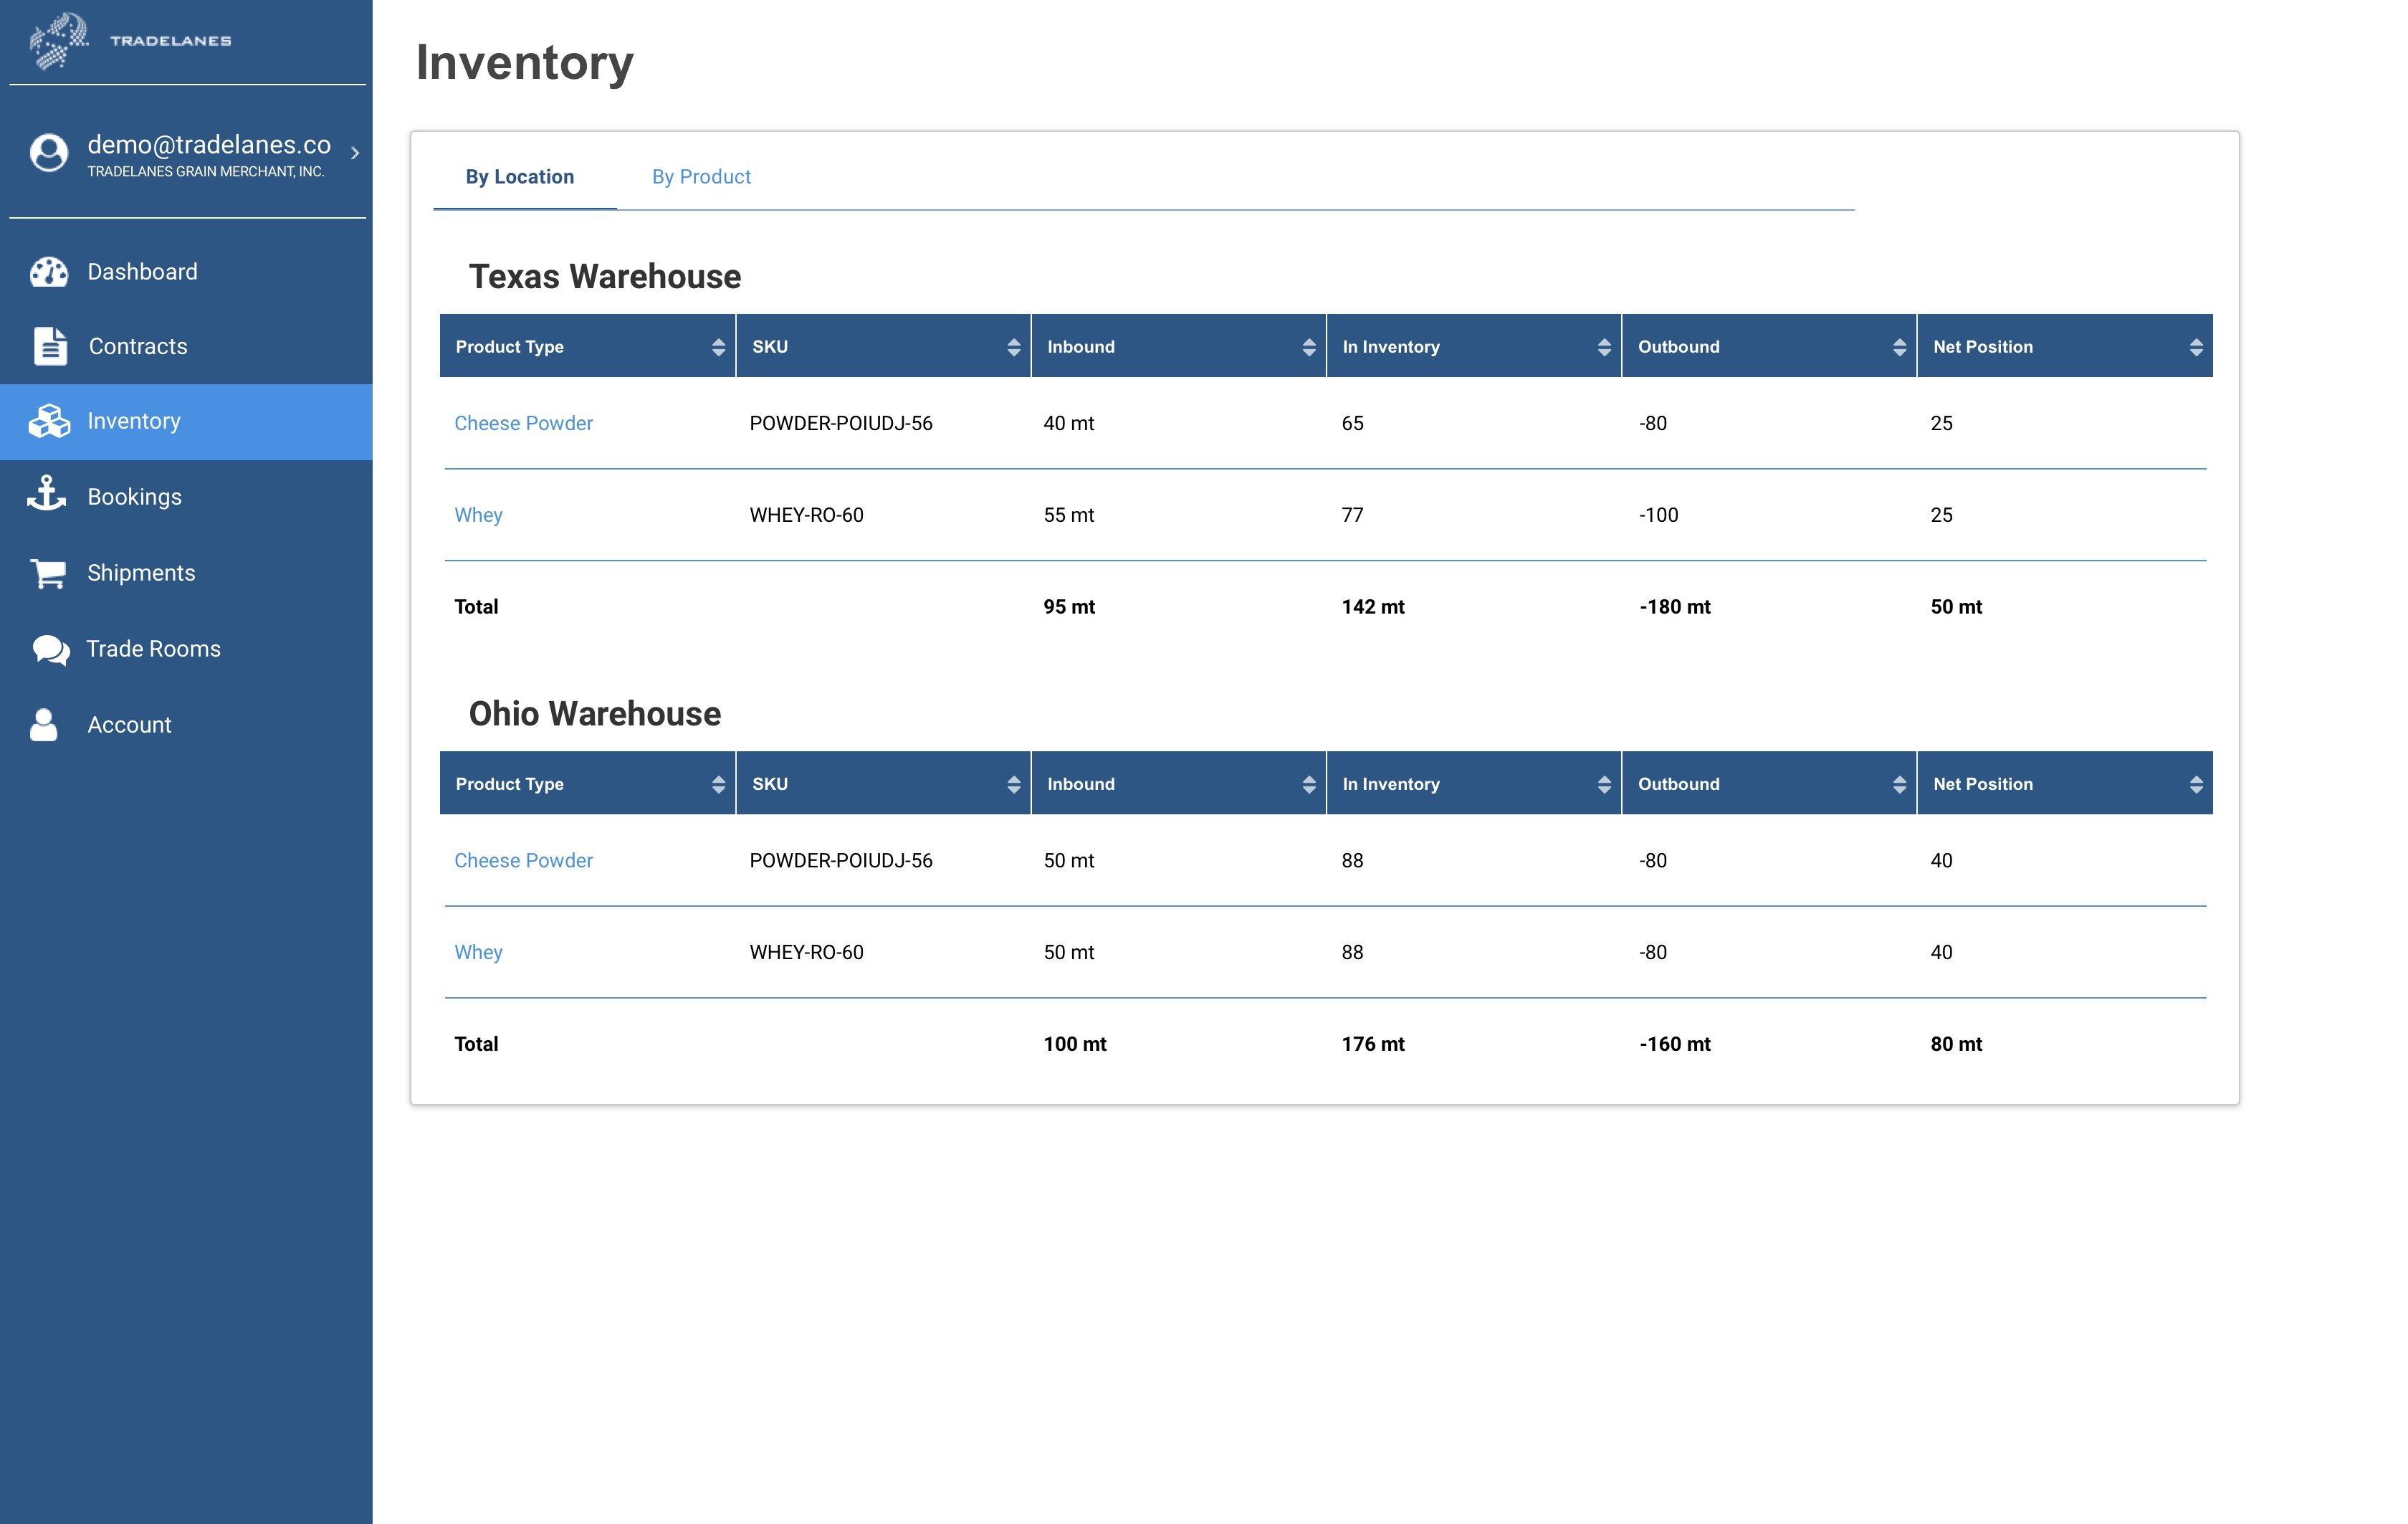 inventorybylocation-1